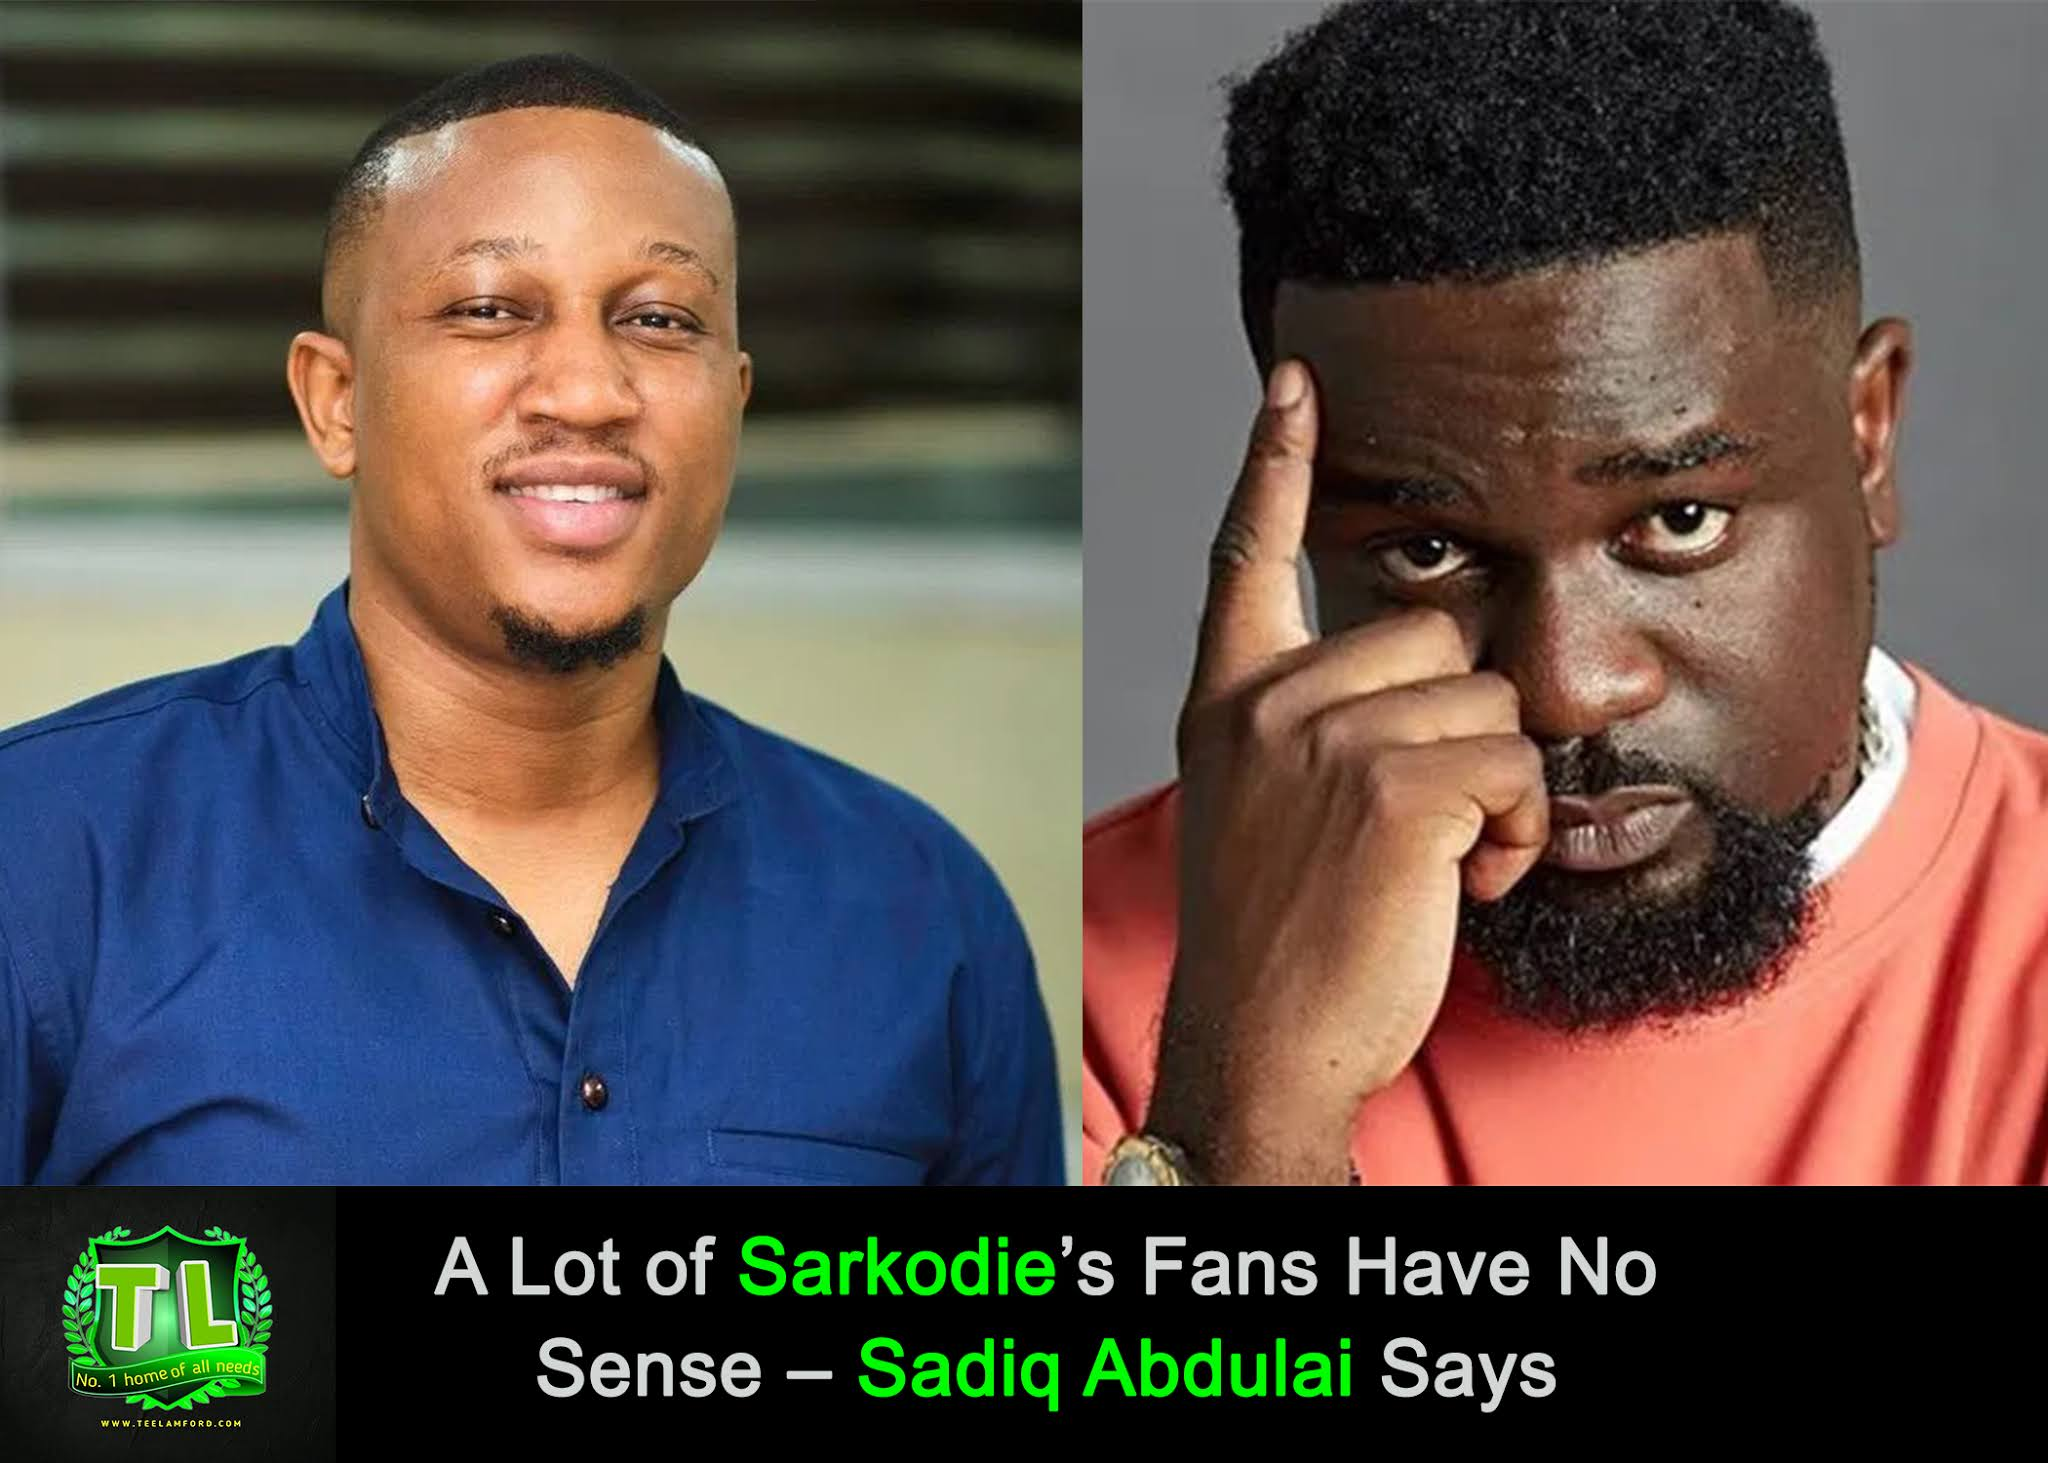 A-Lot-of-Sarkodie-Fans-Have-No-Sense-Sadiq-Abdulai-Teelamford